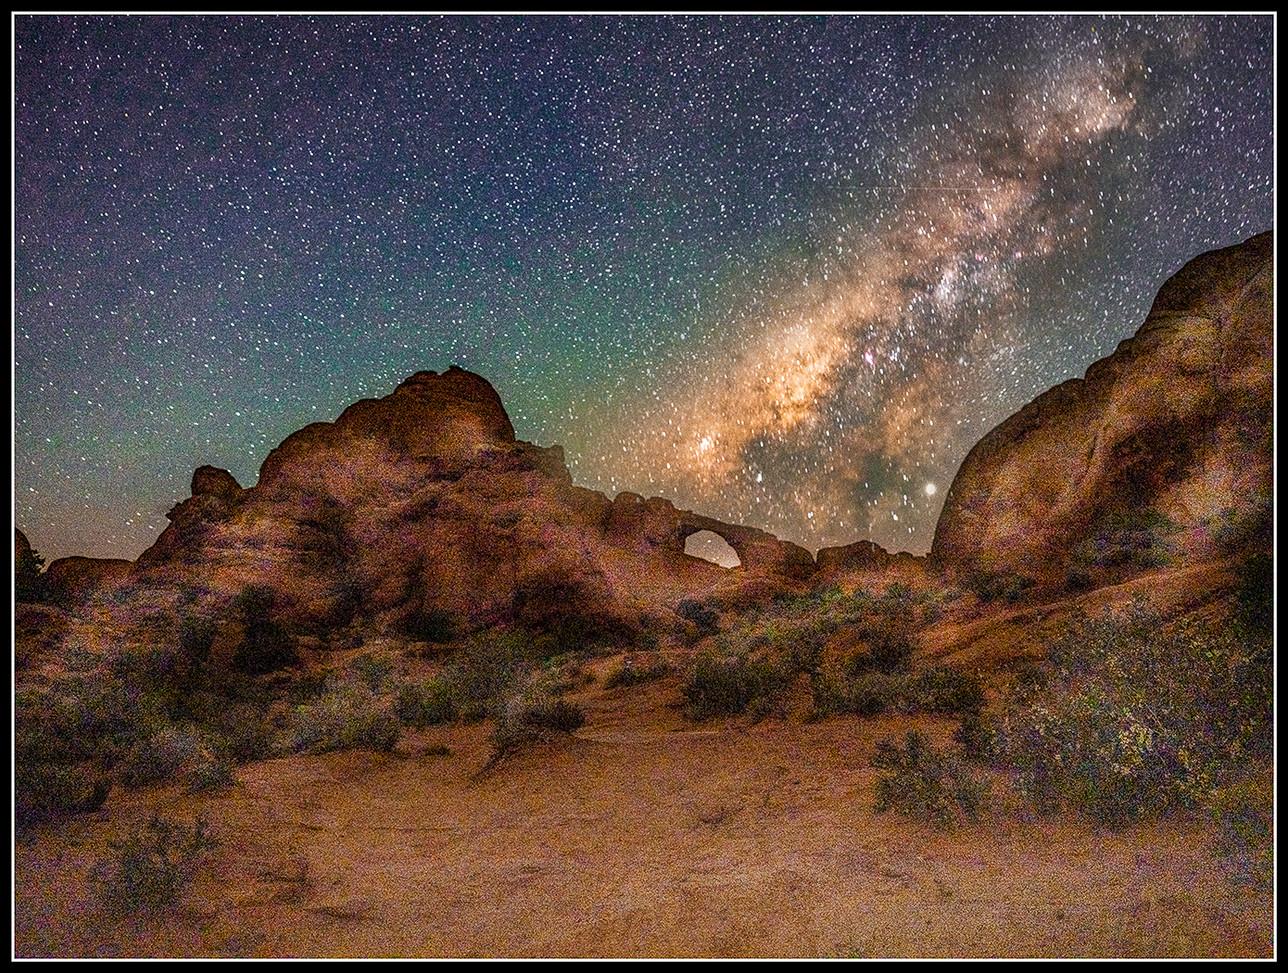 Milky Way Over Skyline Arch By Chris Foley Award  POM Small Color A